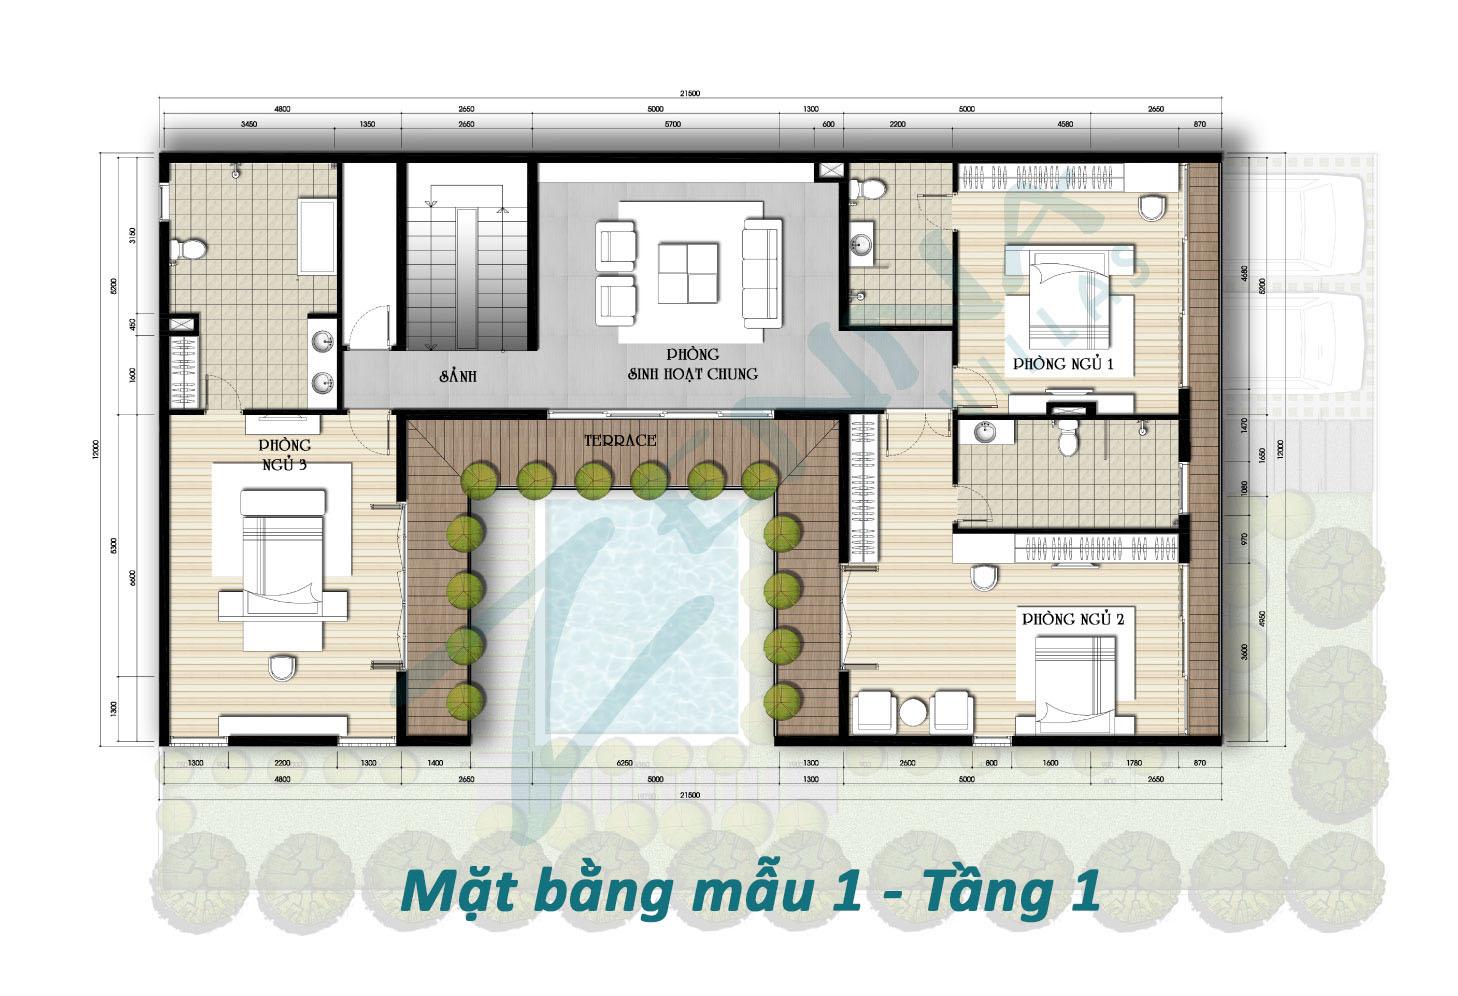 Mặt bằng tầng 1 mẫu 1 biệt thự Zenna Villas